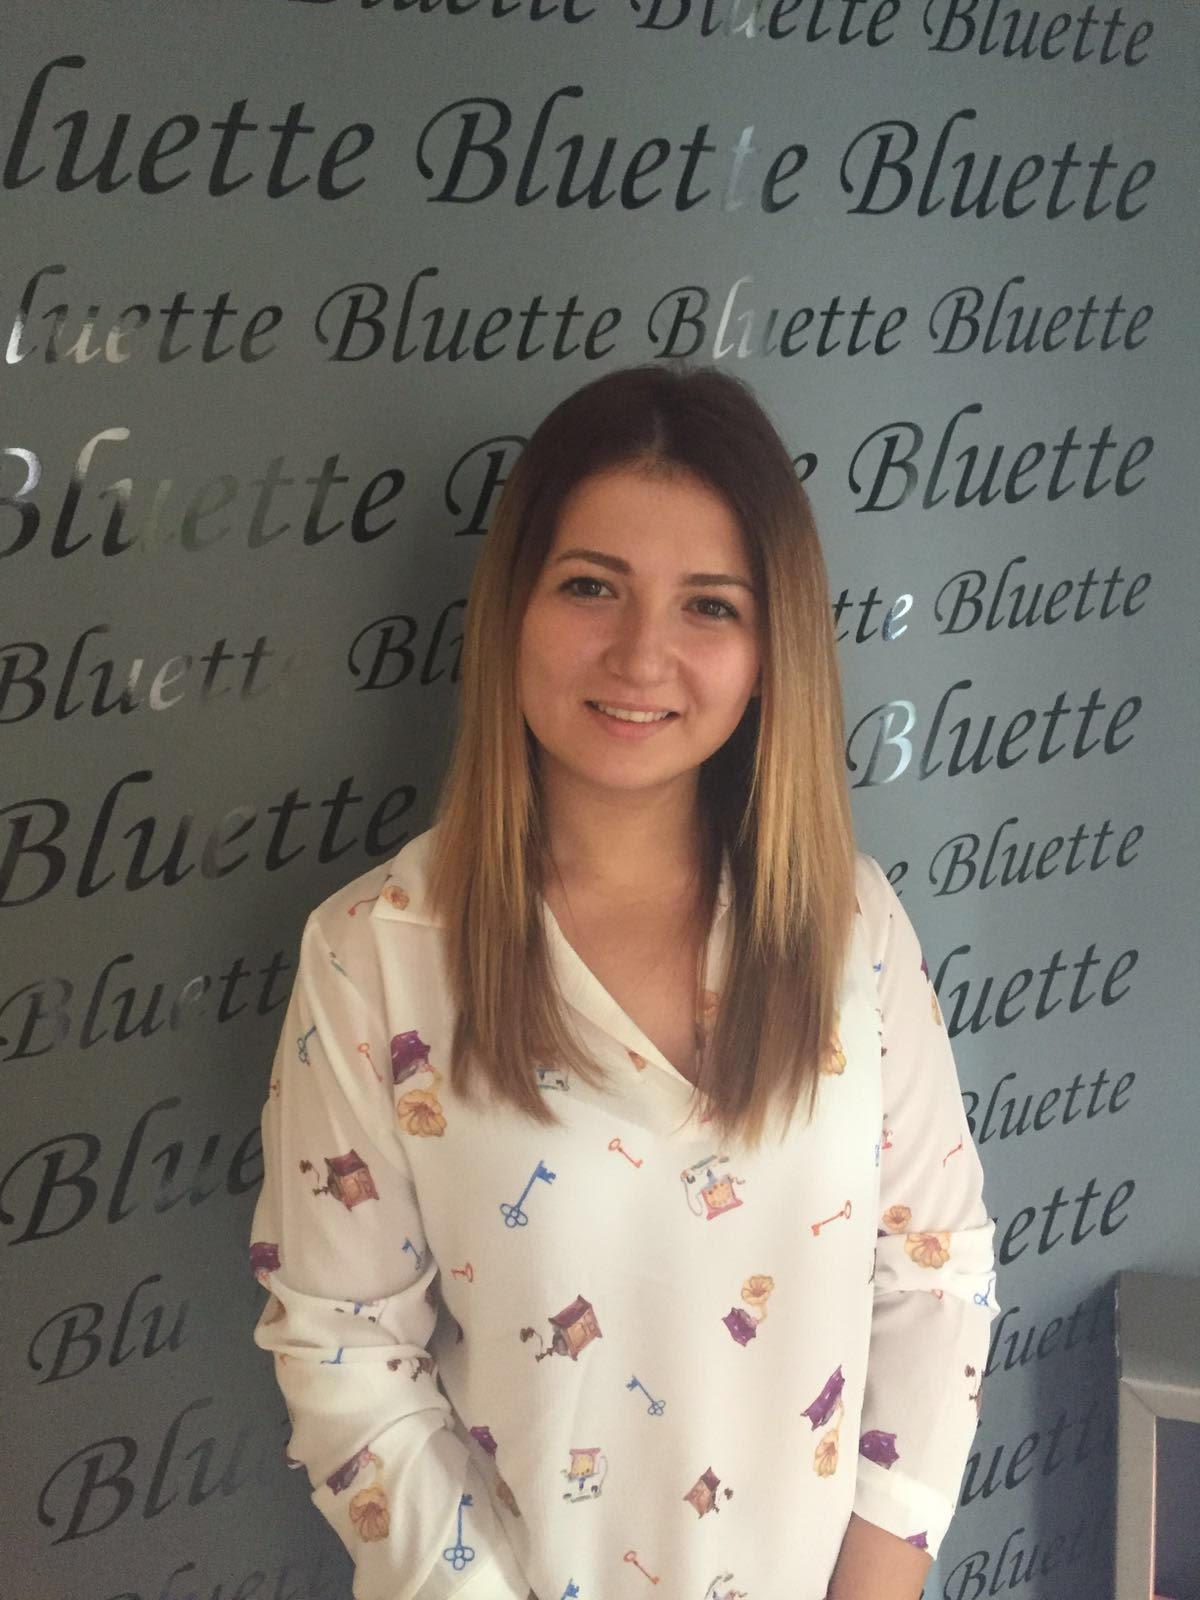 Manaloiu Andreea - Hairstylist